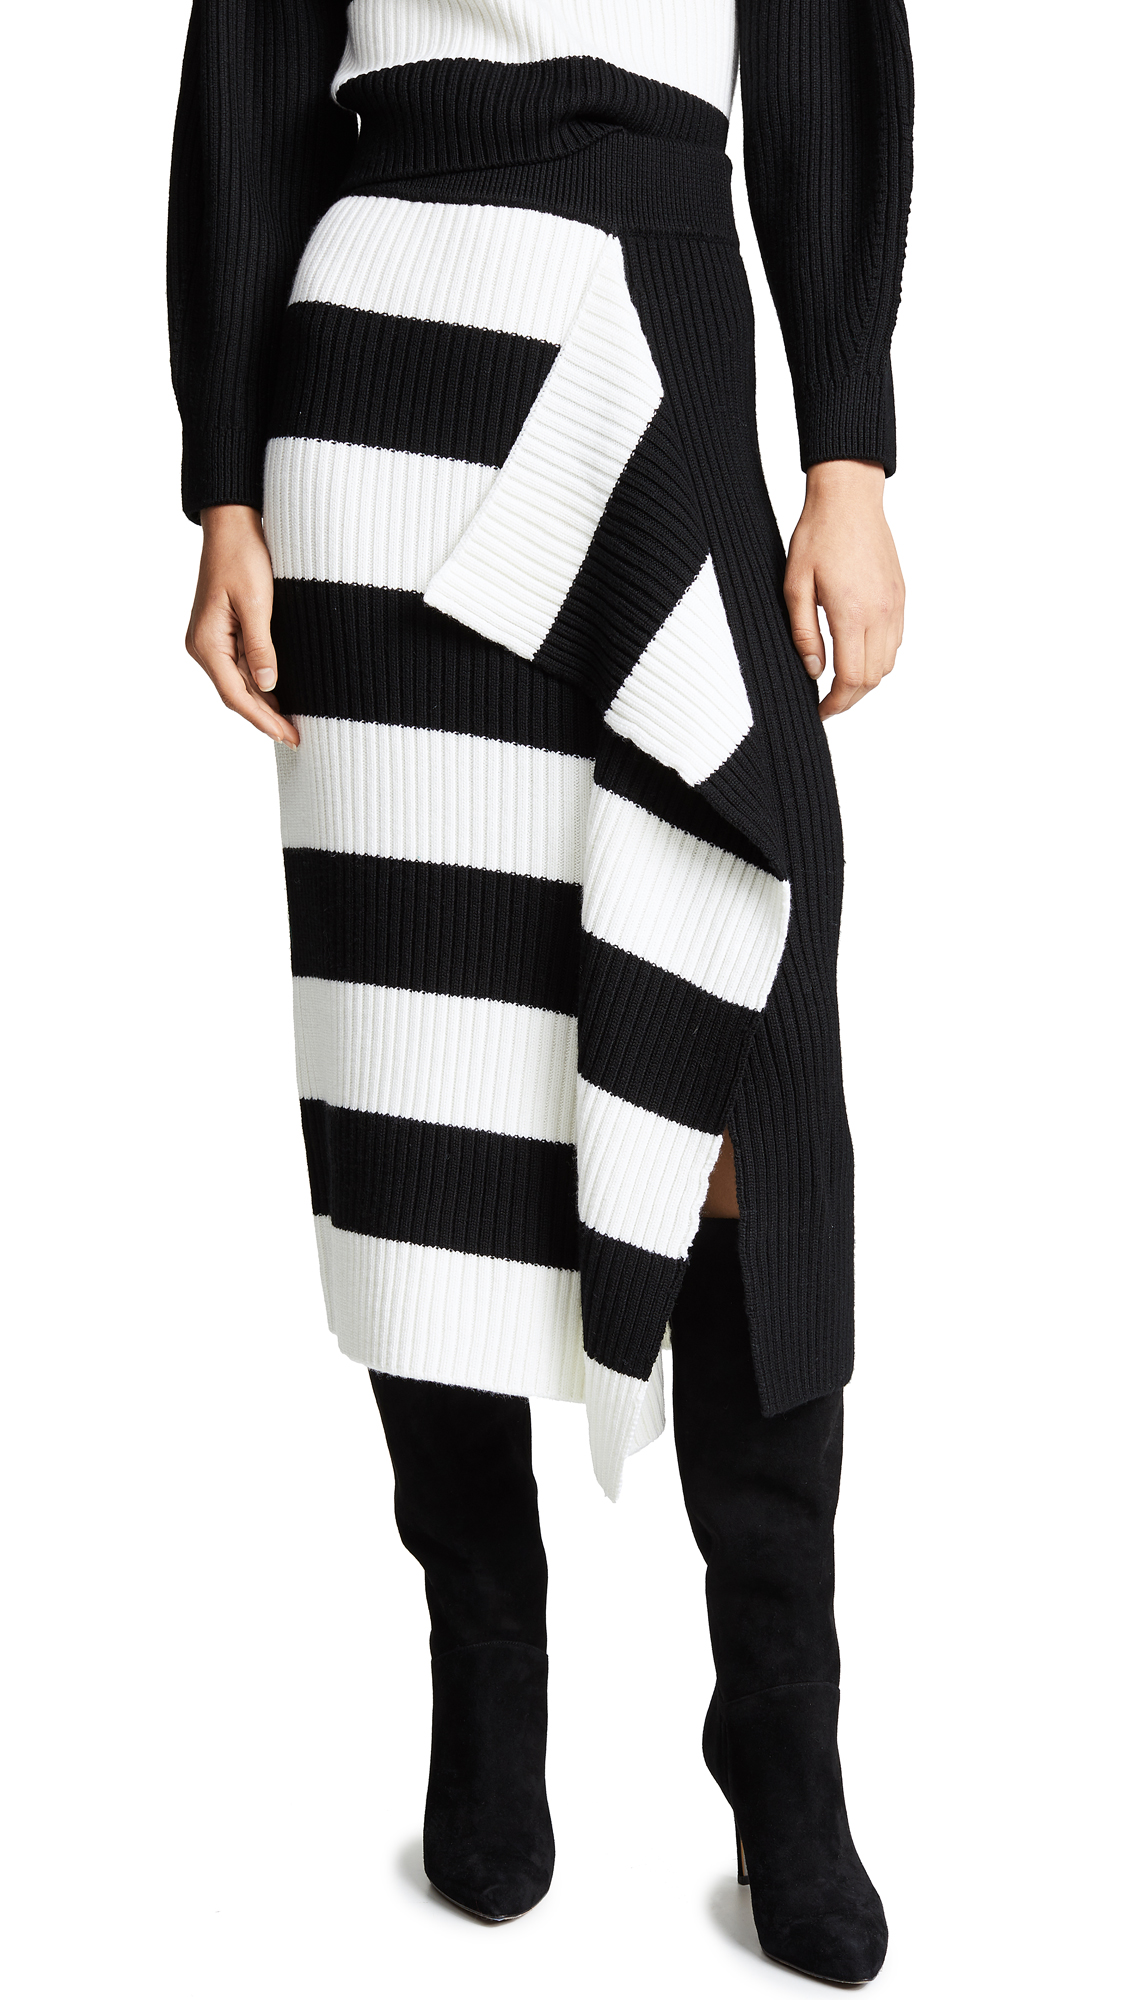 Tibi Origami Flap Wool Skirt